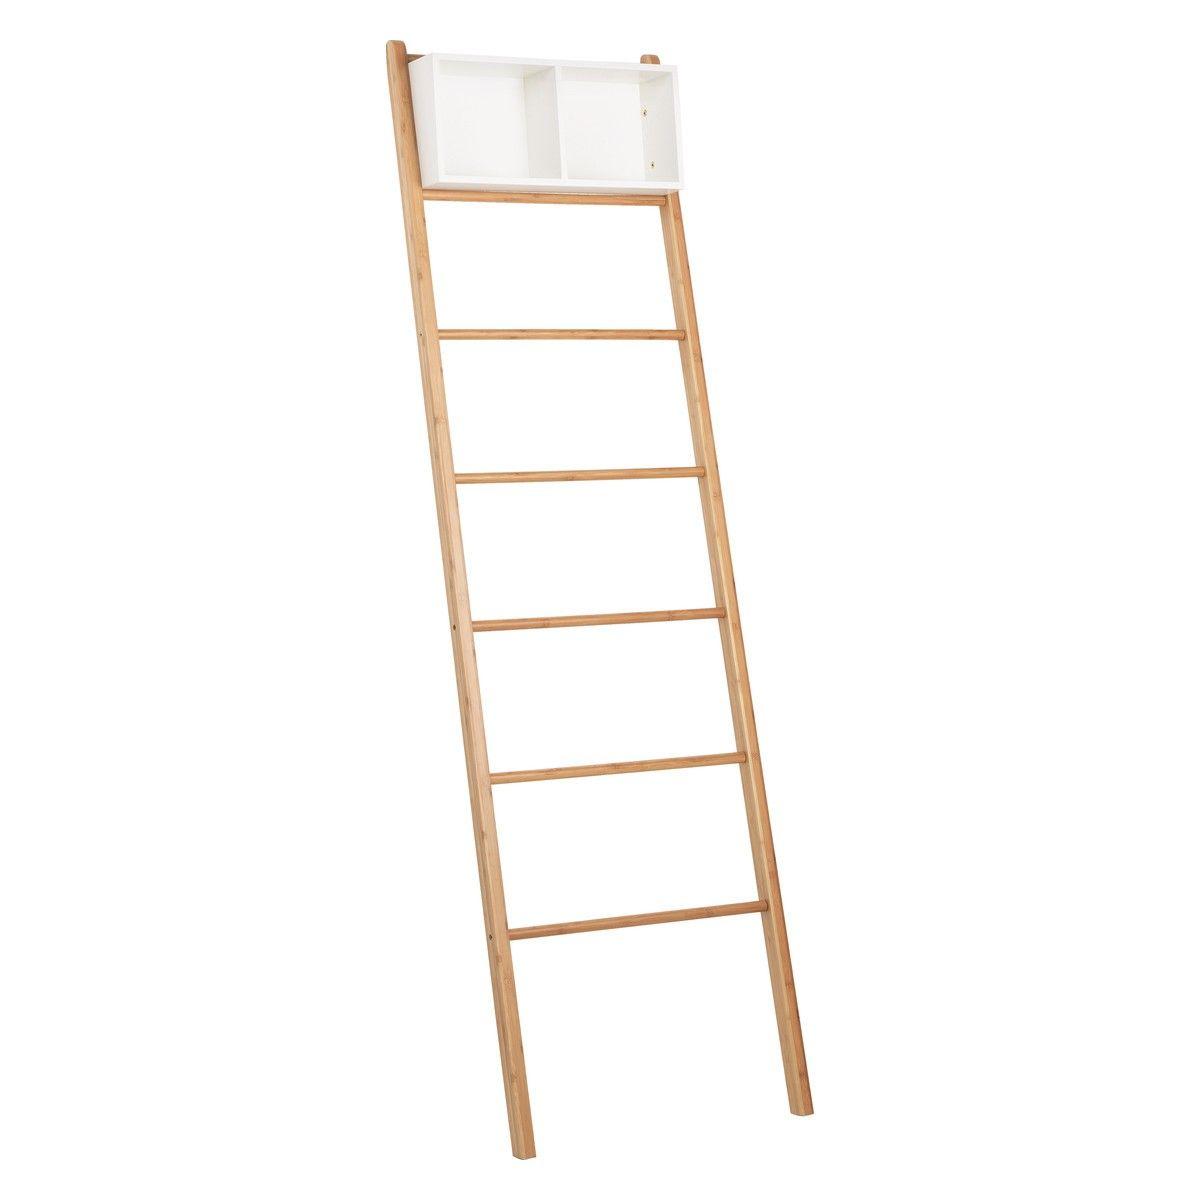 ODIN Bamboo Bathroom Towel Ladder | Buy Now At Habitat UK